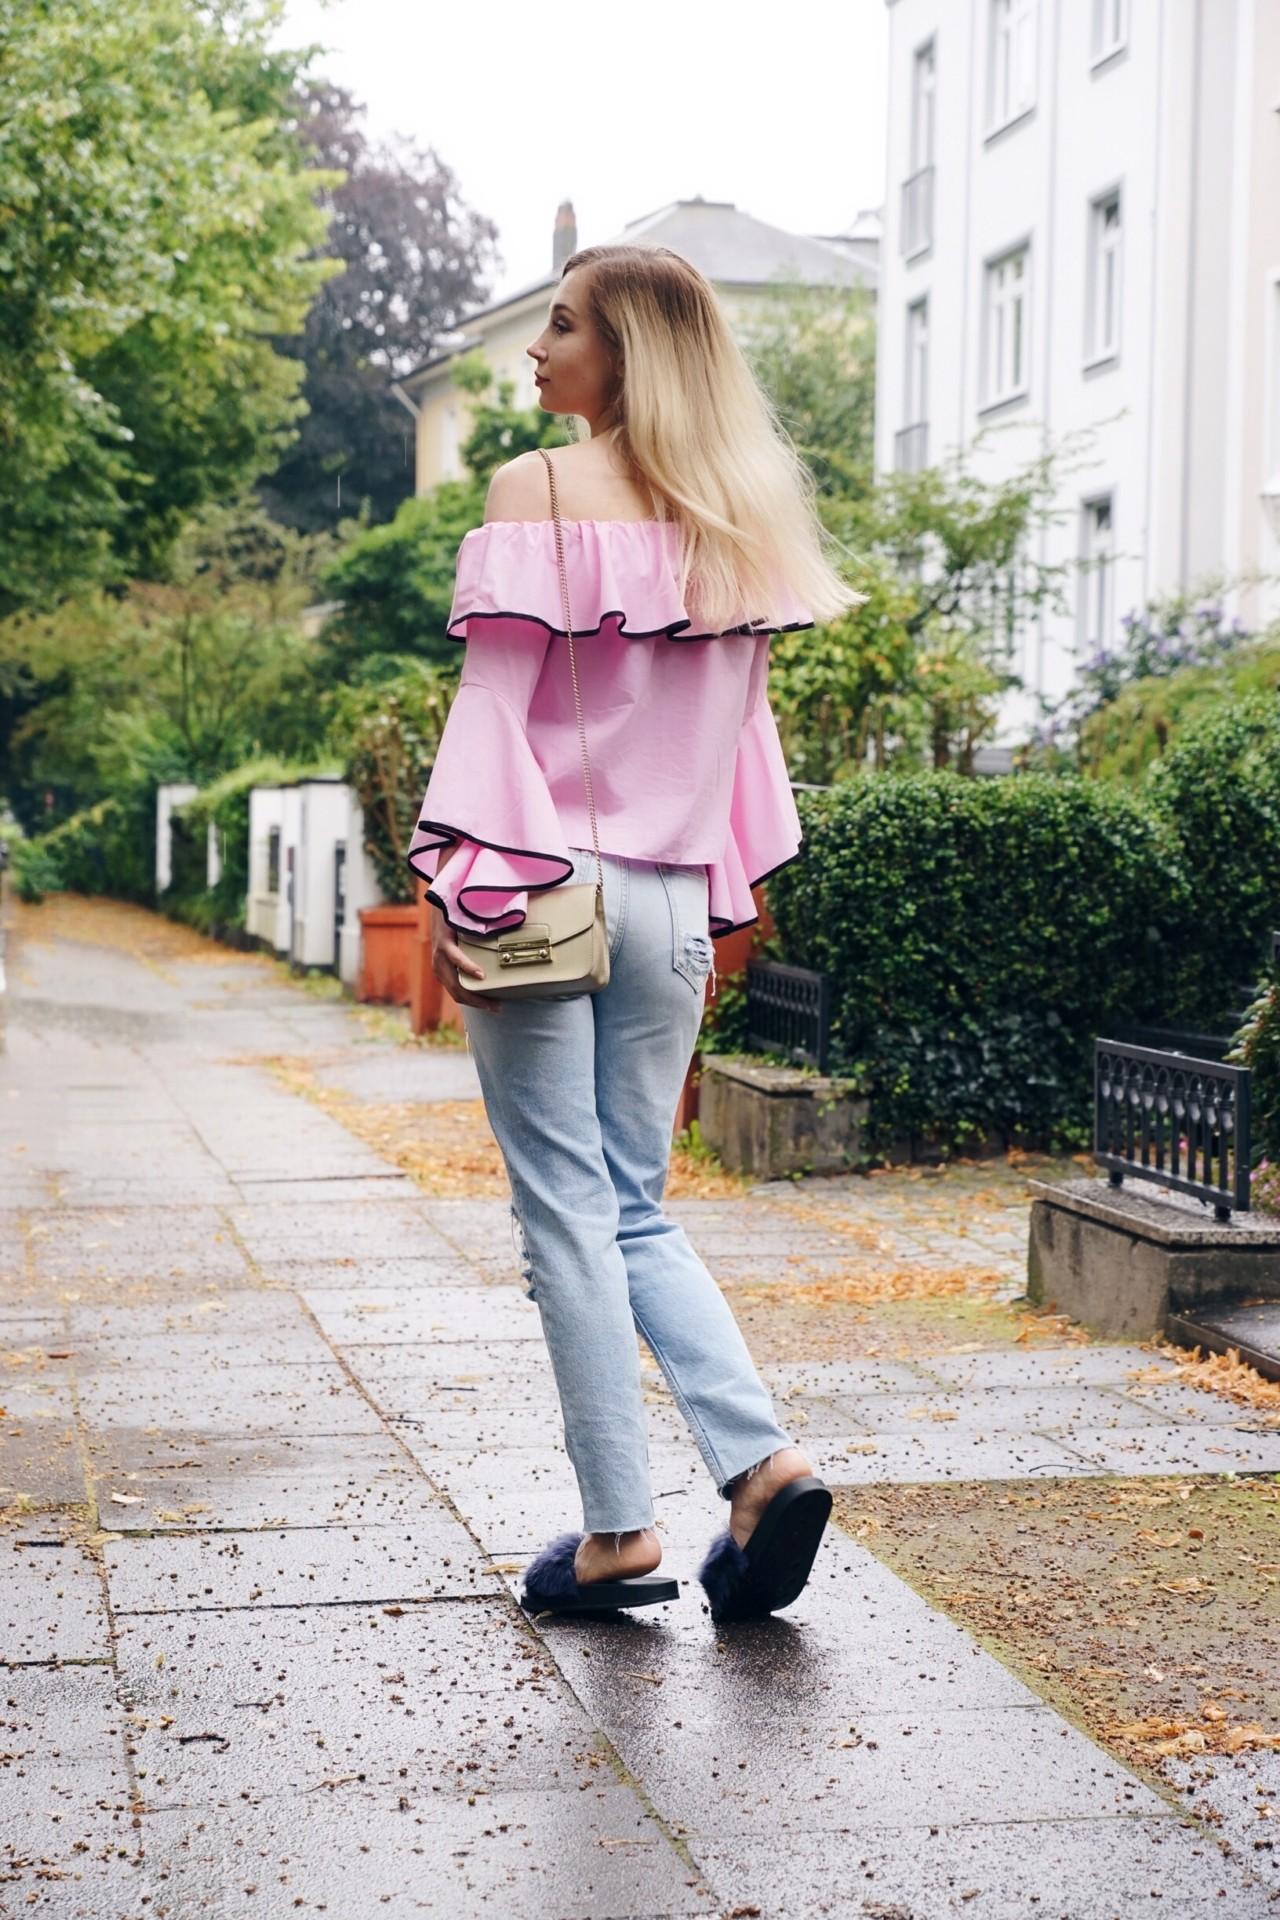 carmen_top_zara_streetstyle_dbkstylez_fashionblog_bershka_мода_стиль_фэшн_блог